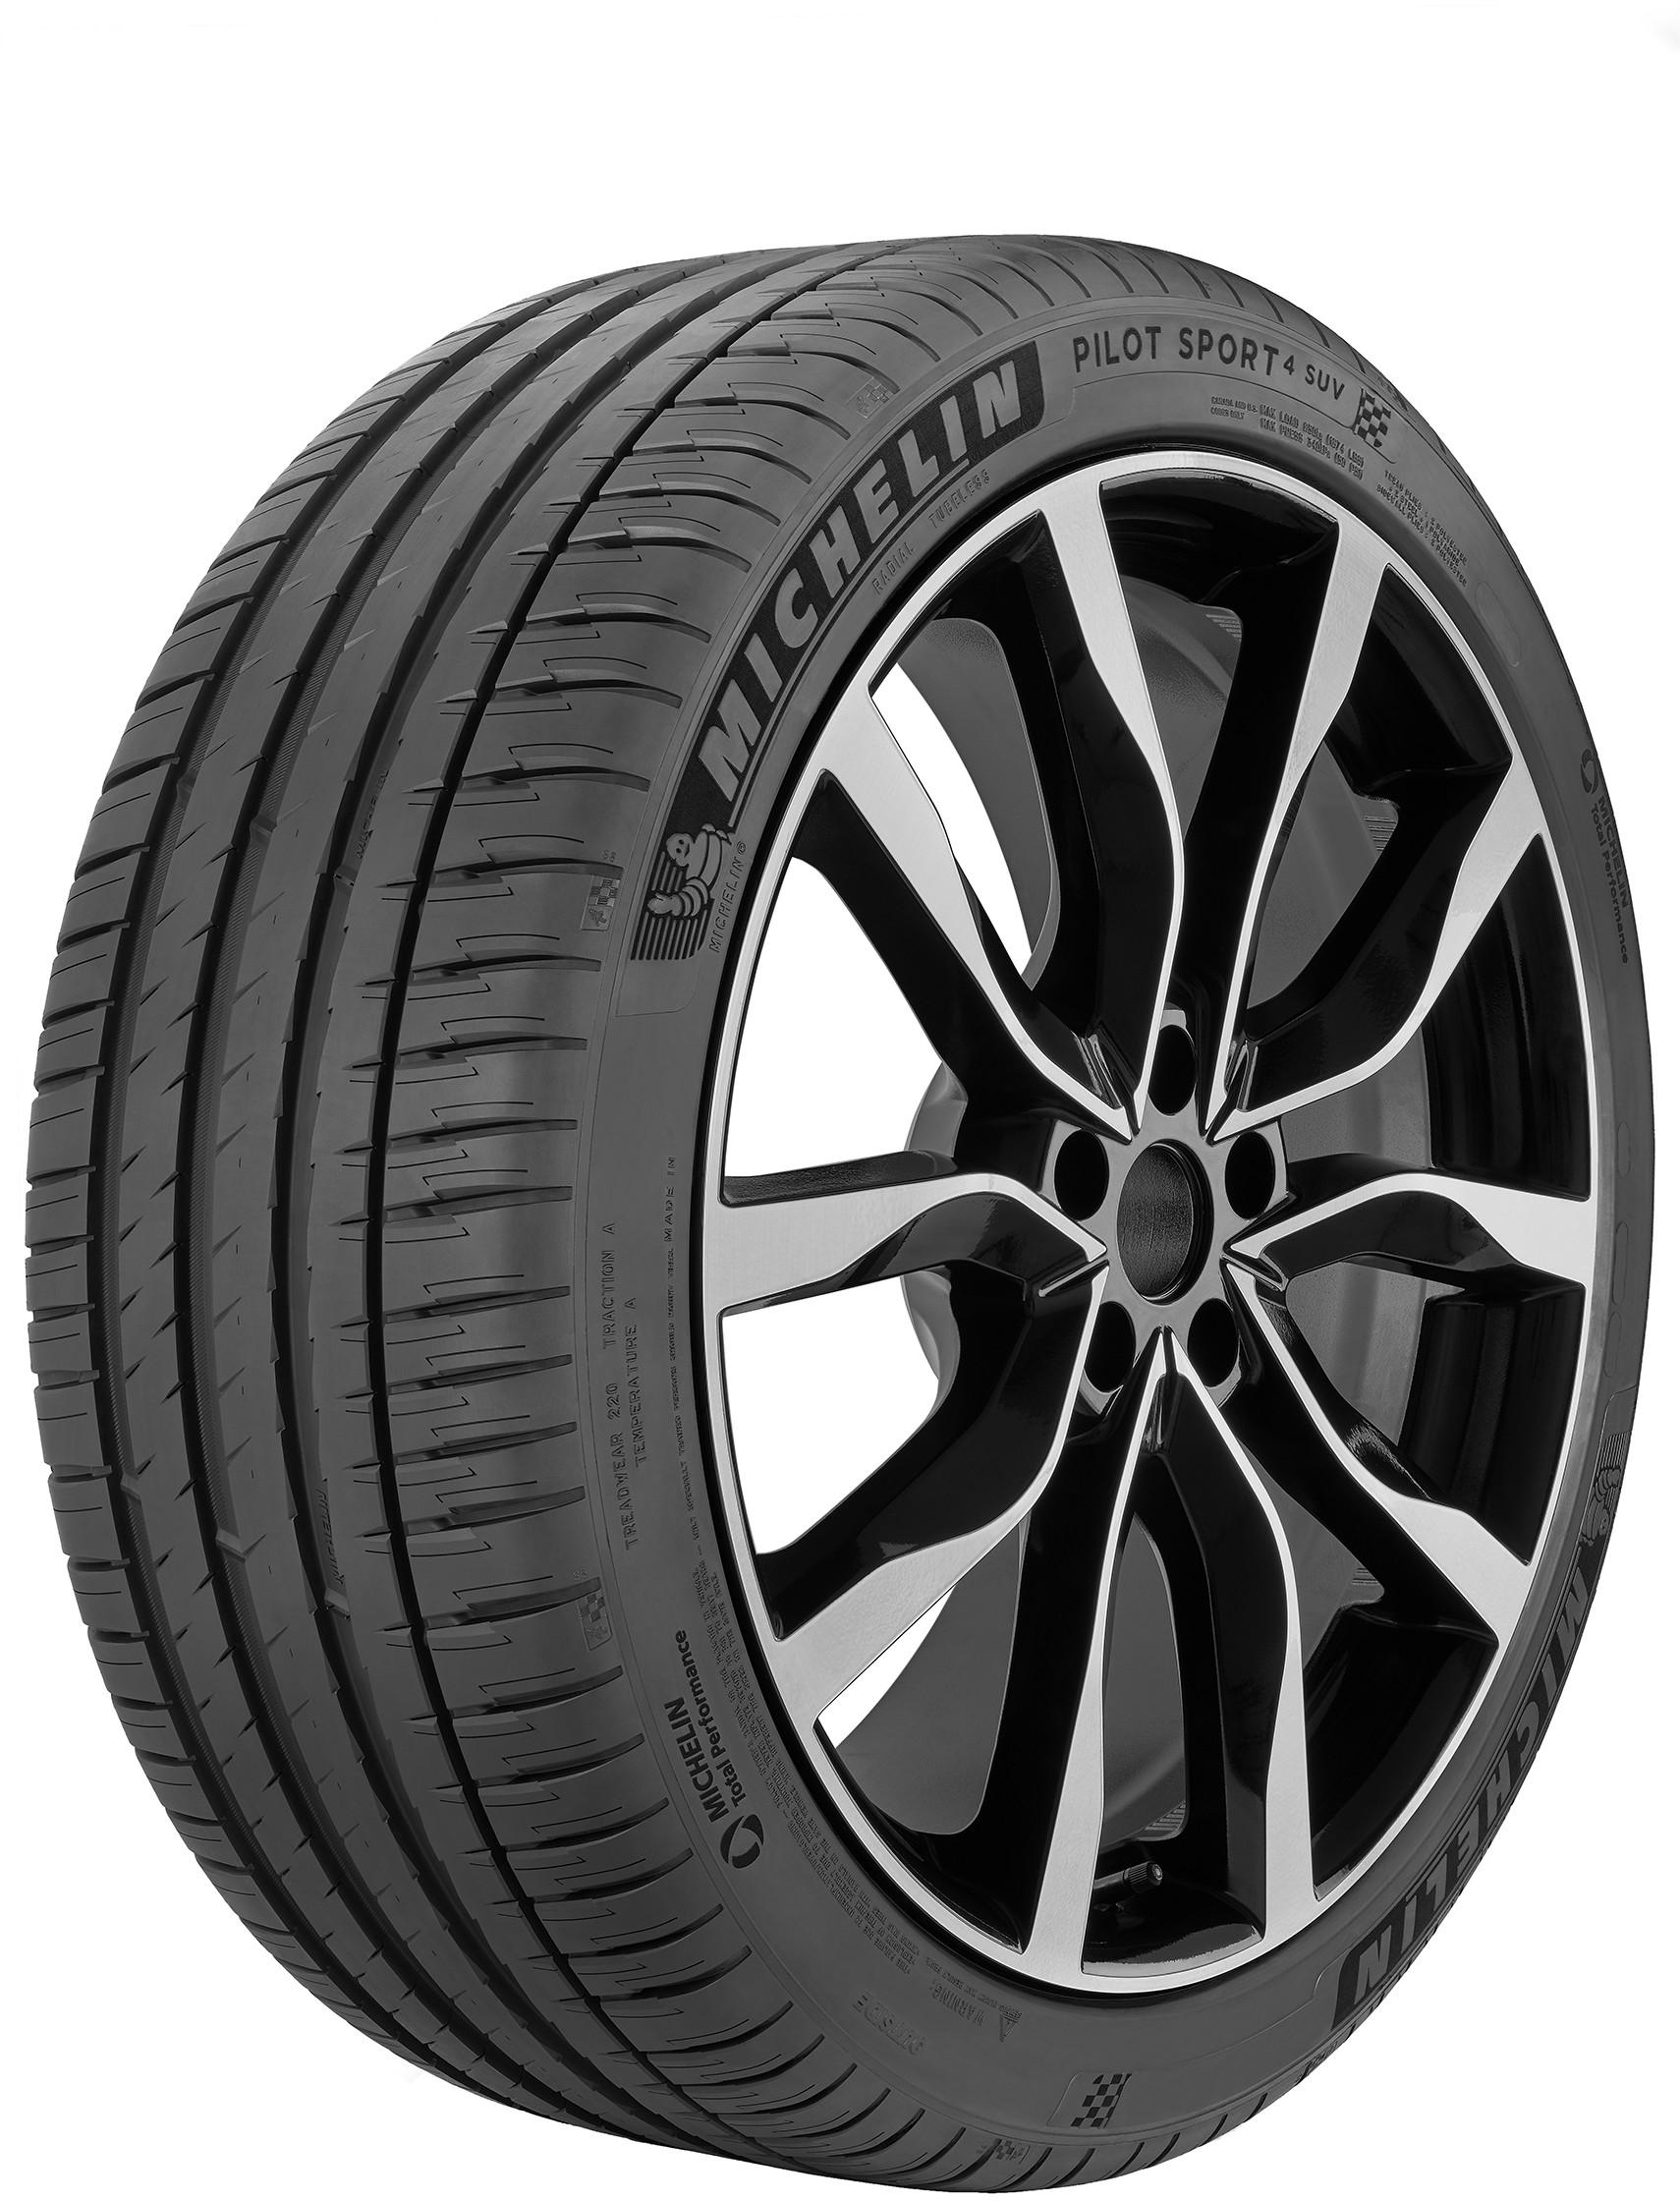 Michelin Pilot Sport 4 SUV 285/40R22 110Y